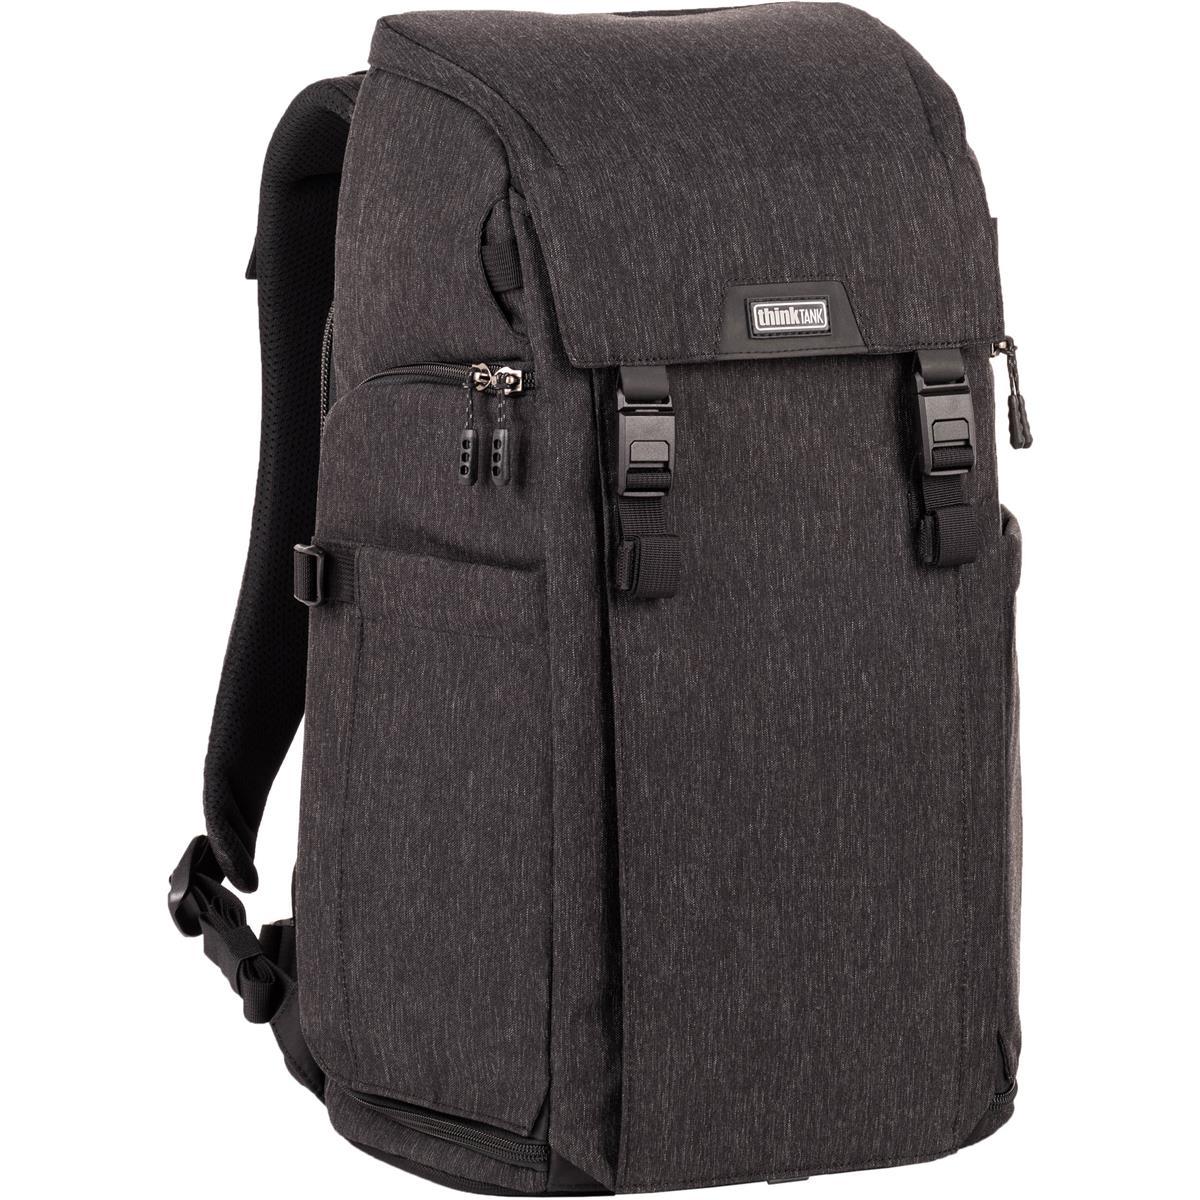 Think Tank Photo Urban Access 15 Backpack (Black)